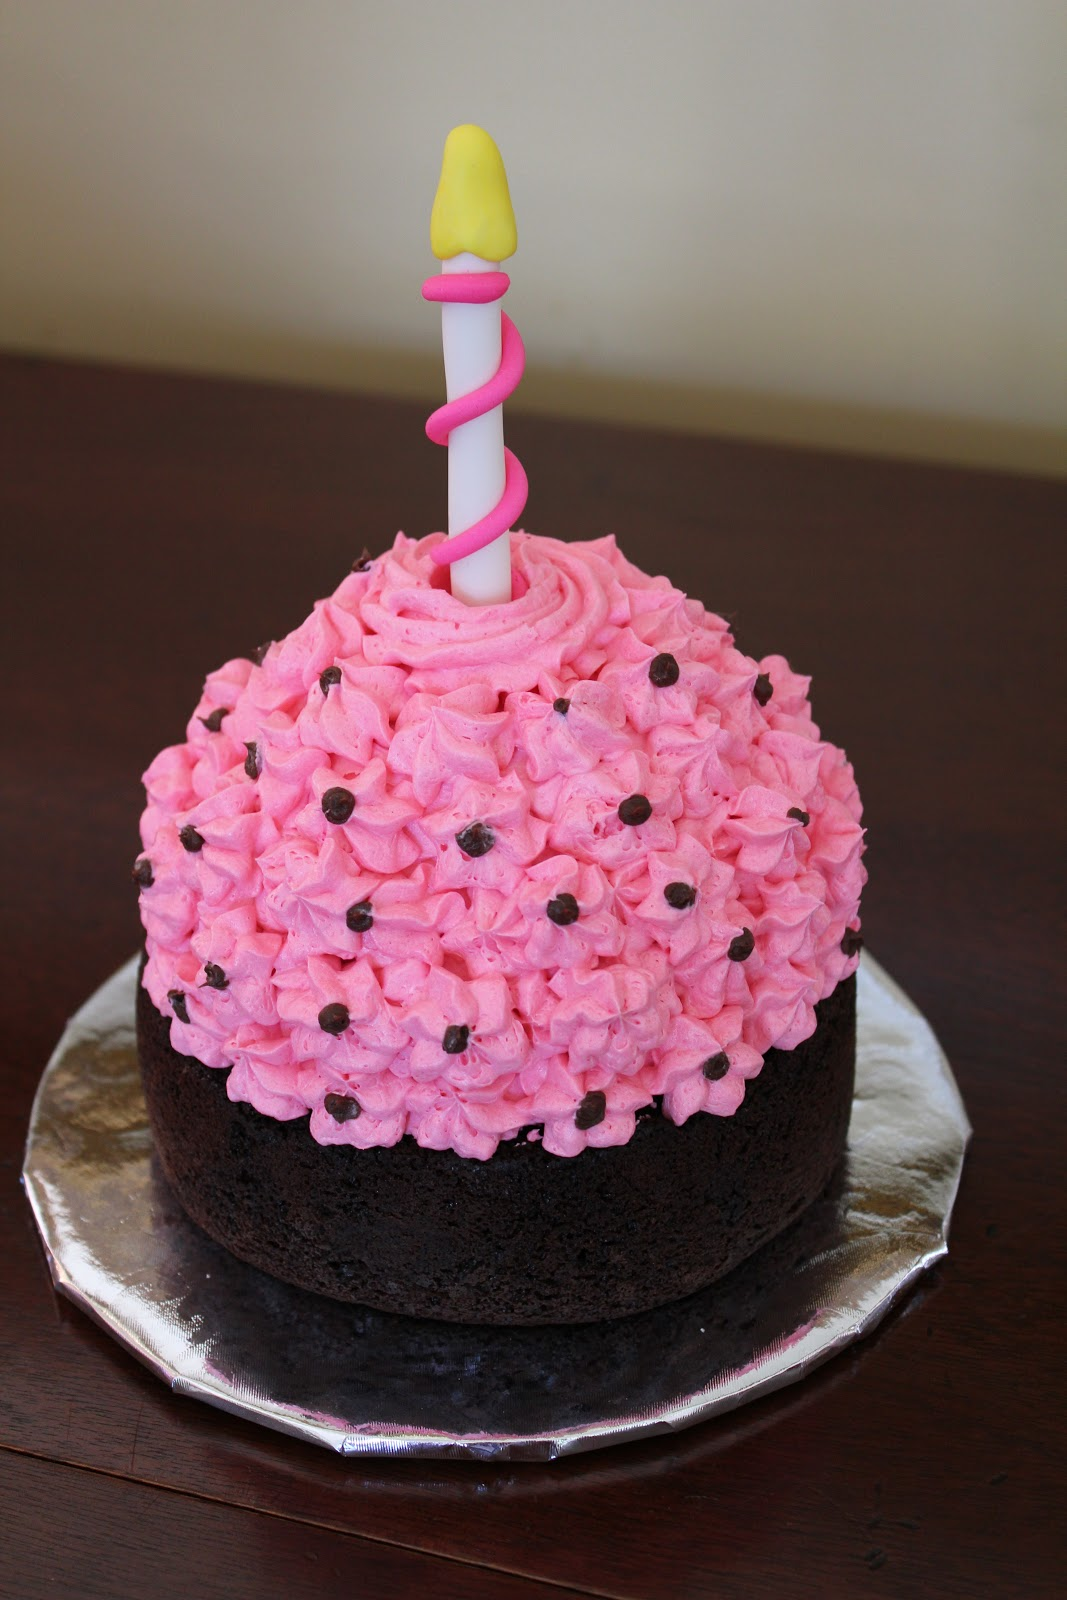 Old World Cake Co Llc Emmi Kates 1st Birthday Princess Cake